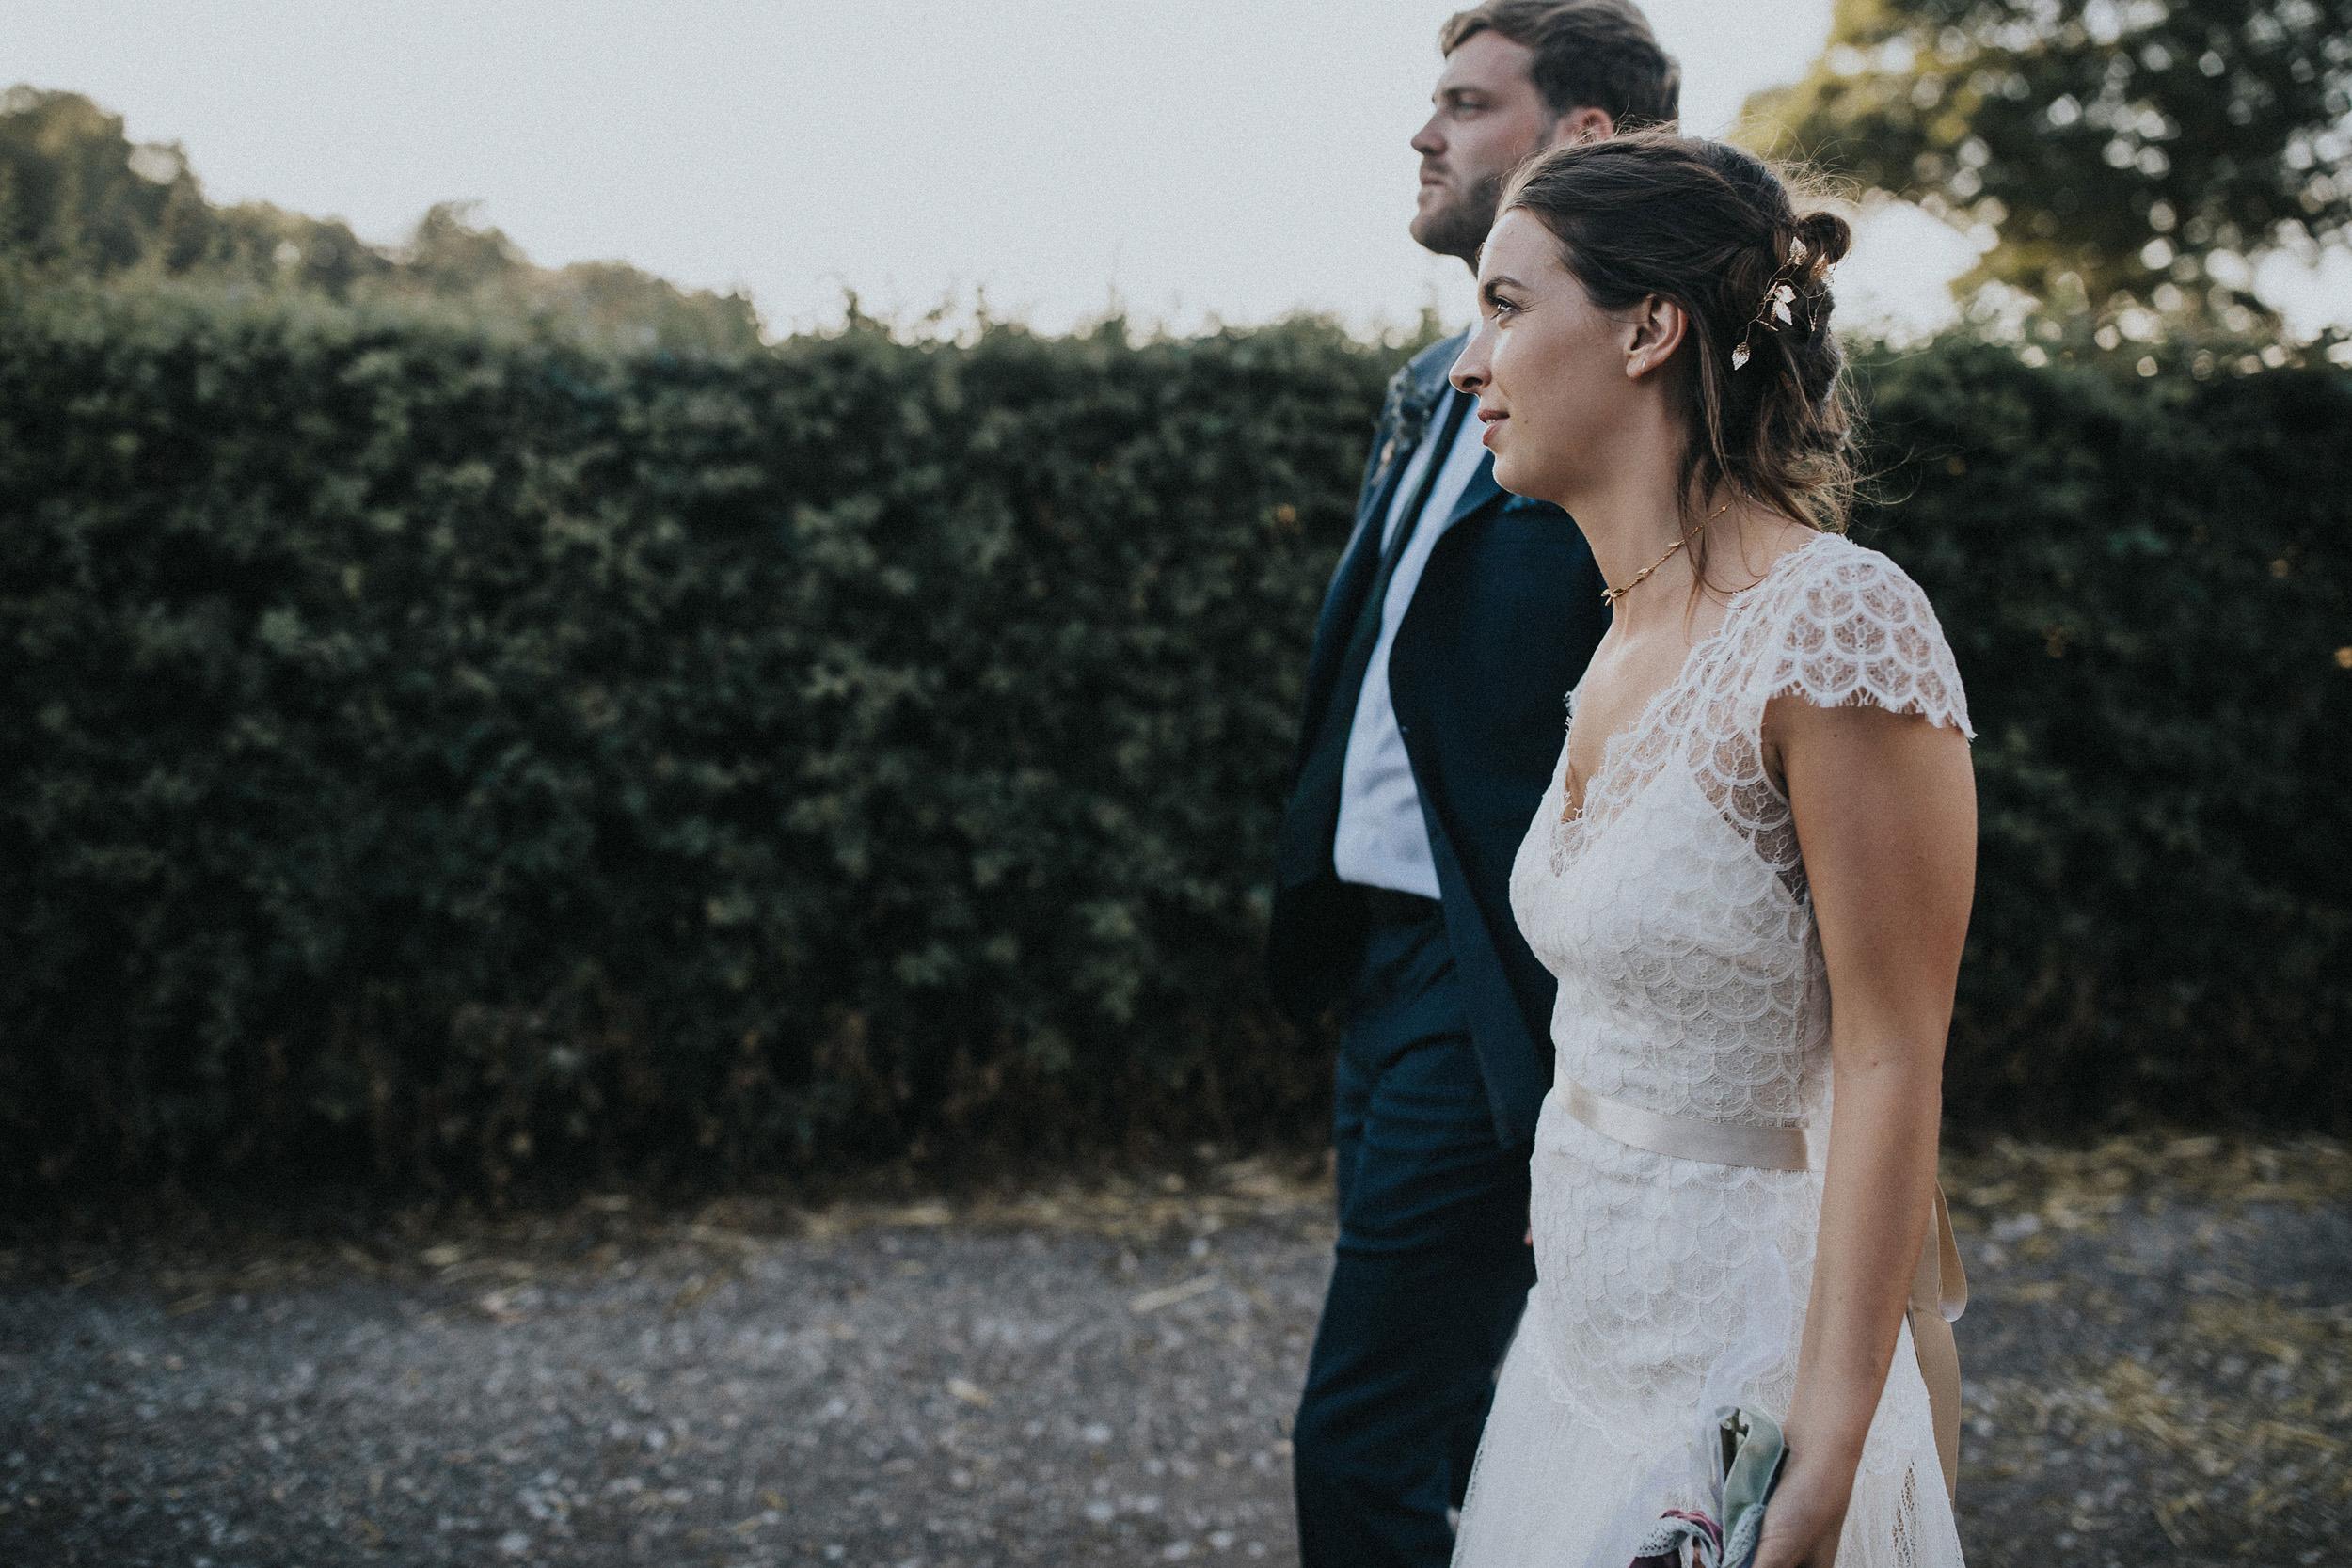 Martha-Laid-Back-Garden-Wedding-Lace-Wedding-Dress-Bohemian-Kate-Beaumont-56.jpg